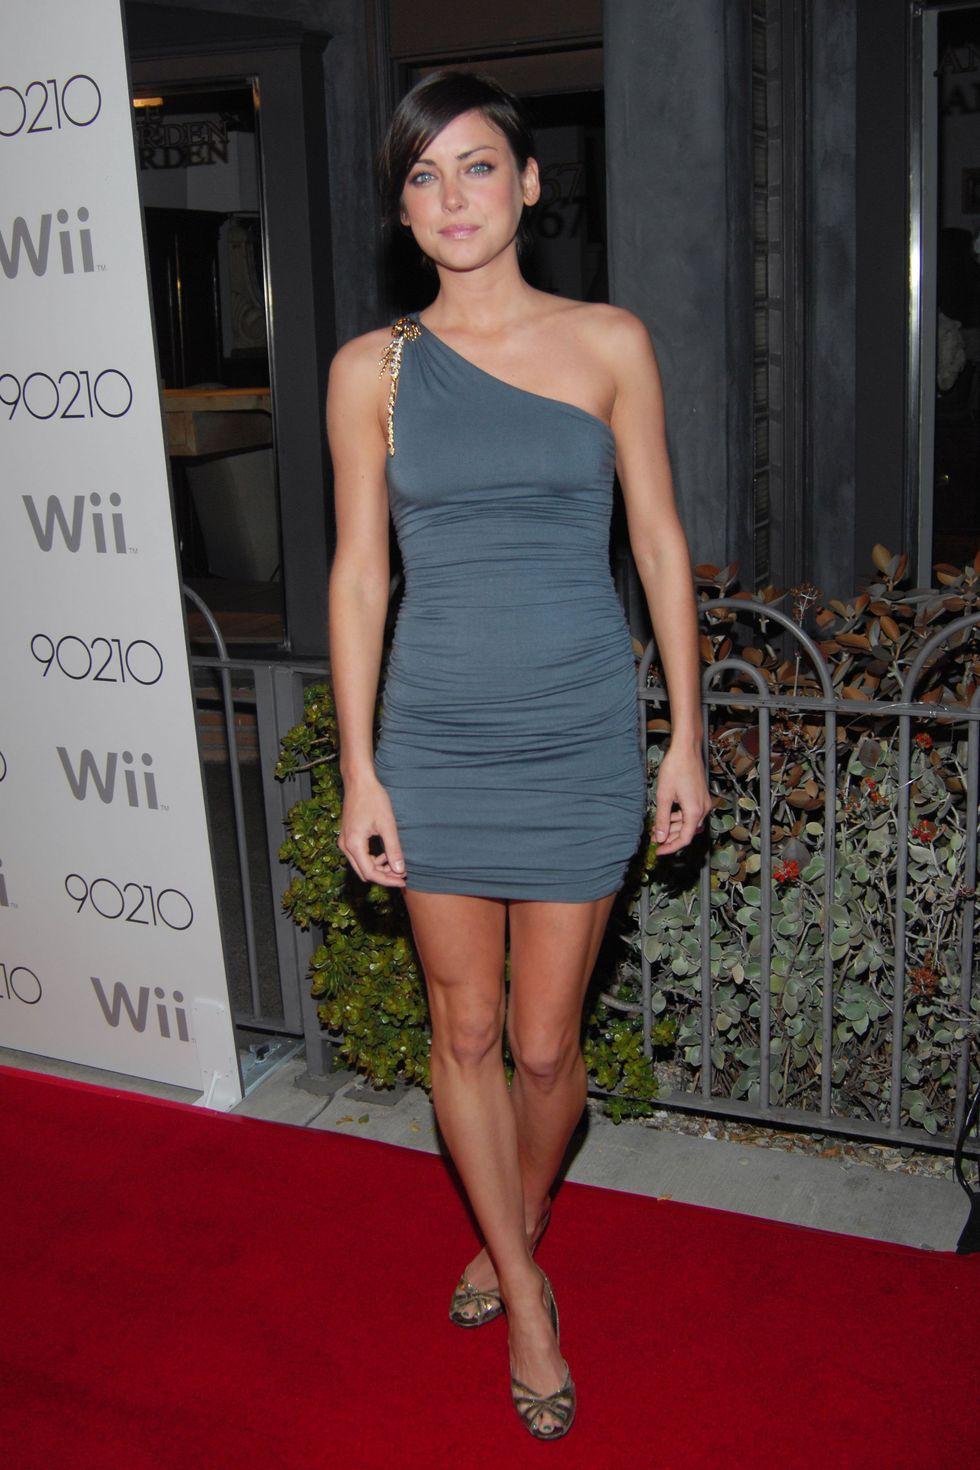 annalynne-mccord-90210-season-wrap-party-01